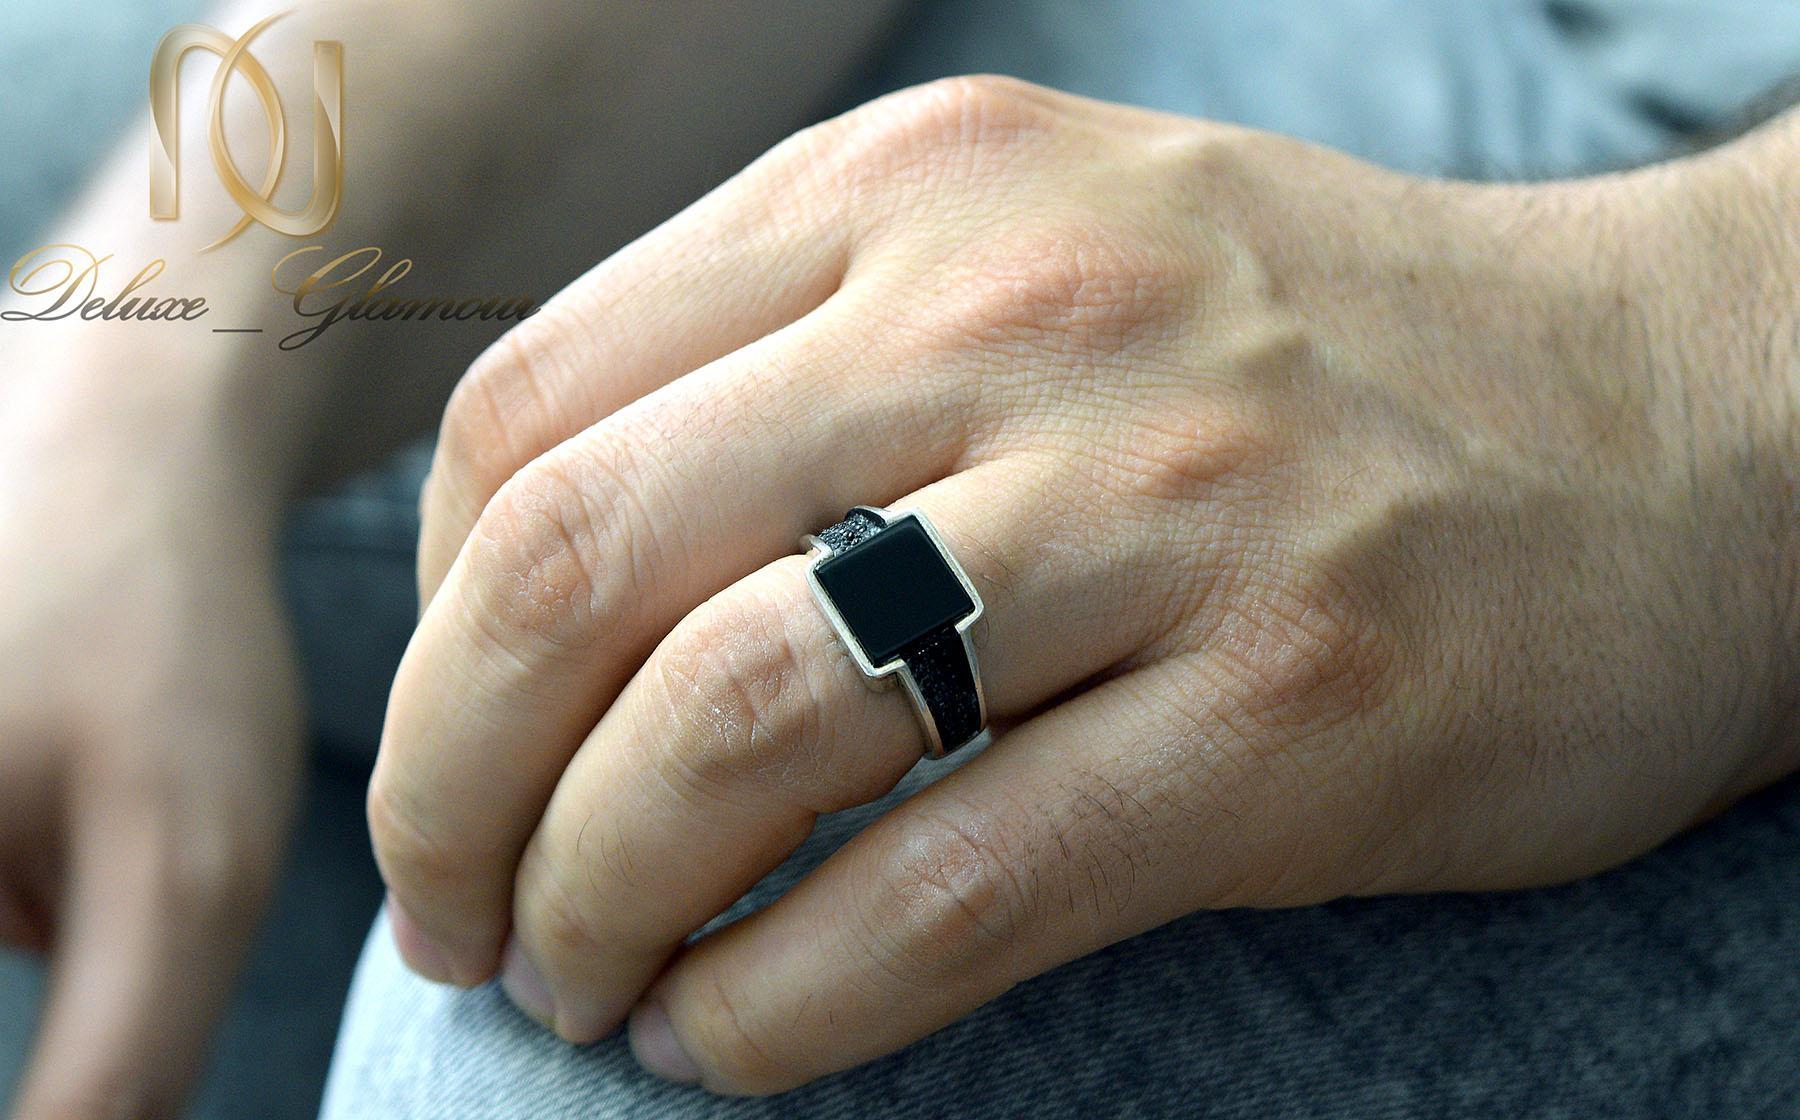 انگشتر نقره اسپرت مردانه نگین مربعی rg-n388